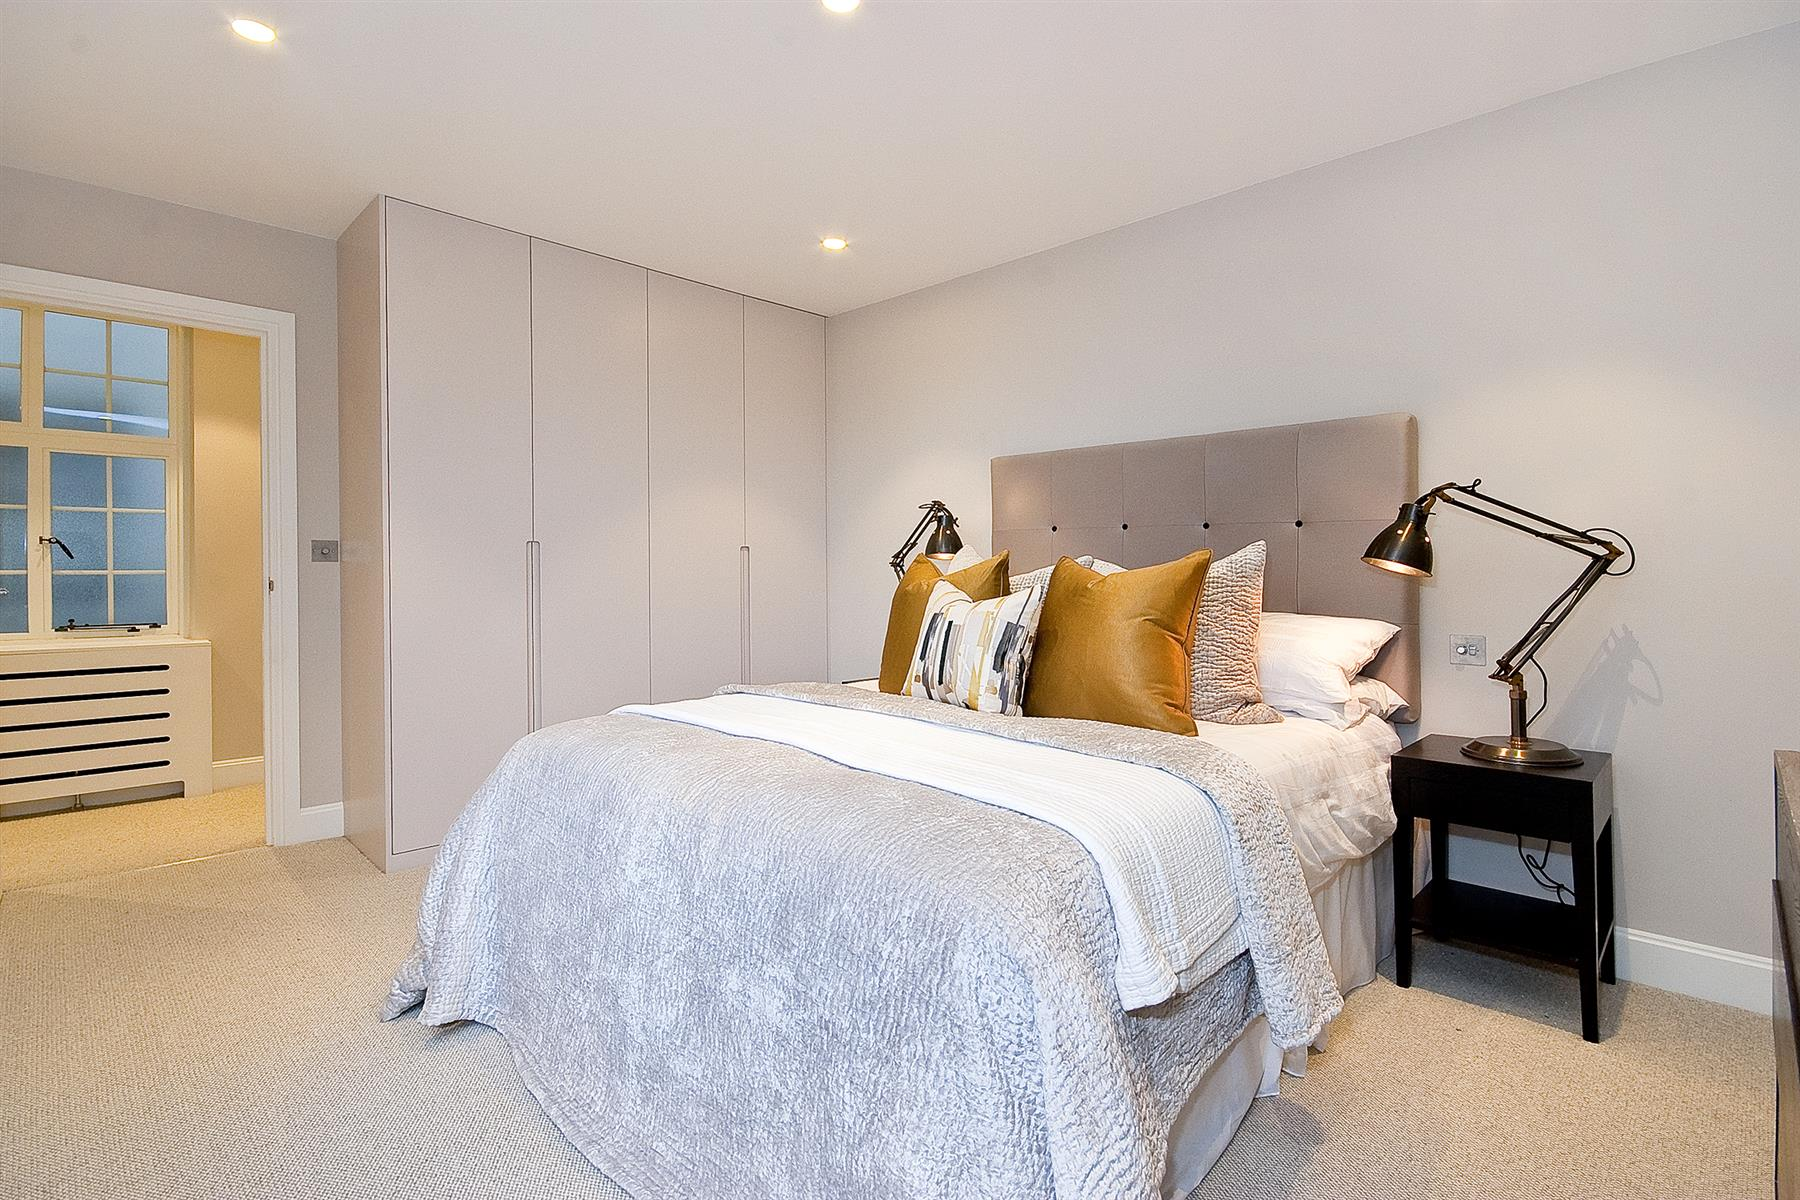 Properties For Sale 1 Bedroom Apartment Drayton Gardens South Kensington Sw10 Plaza Estates